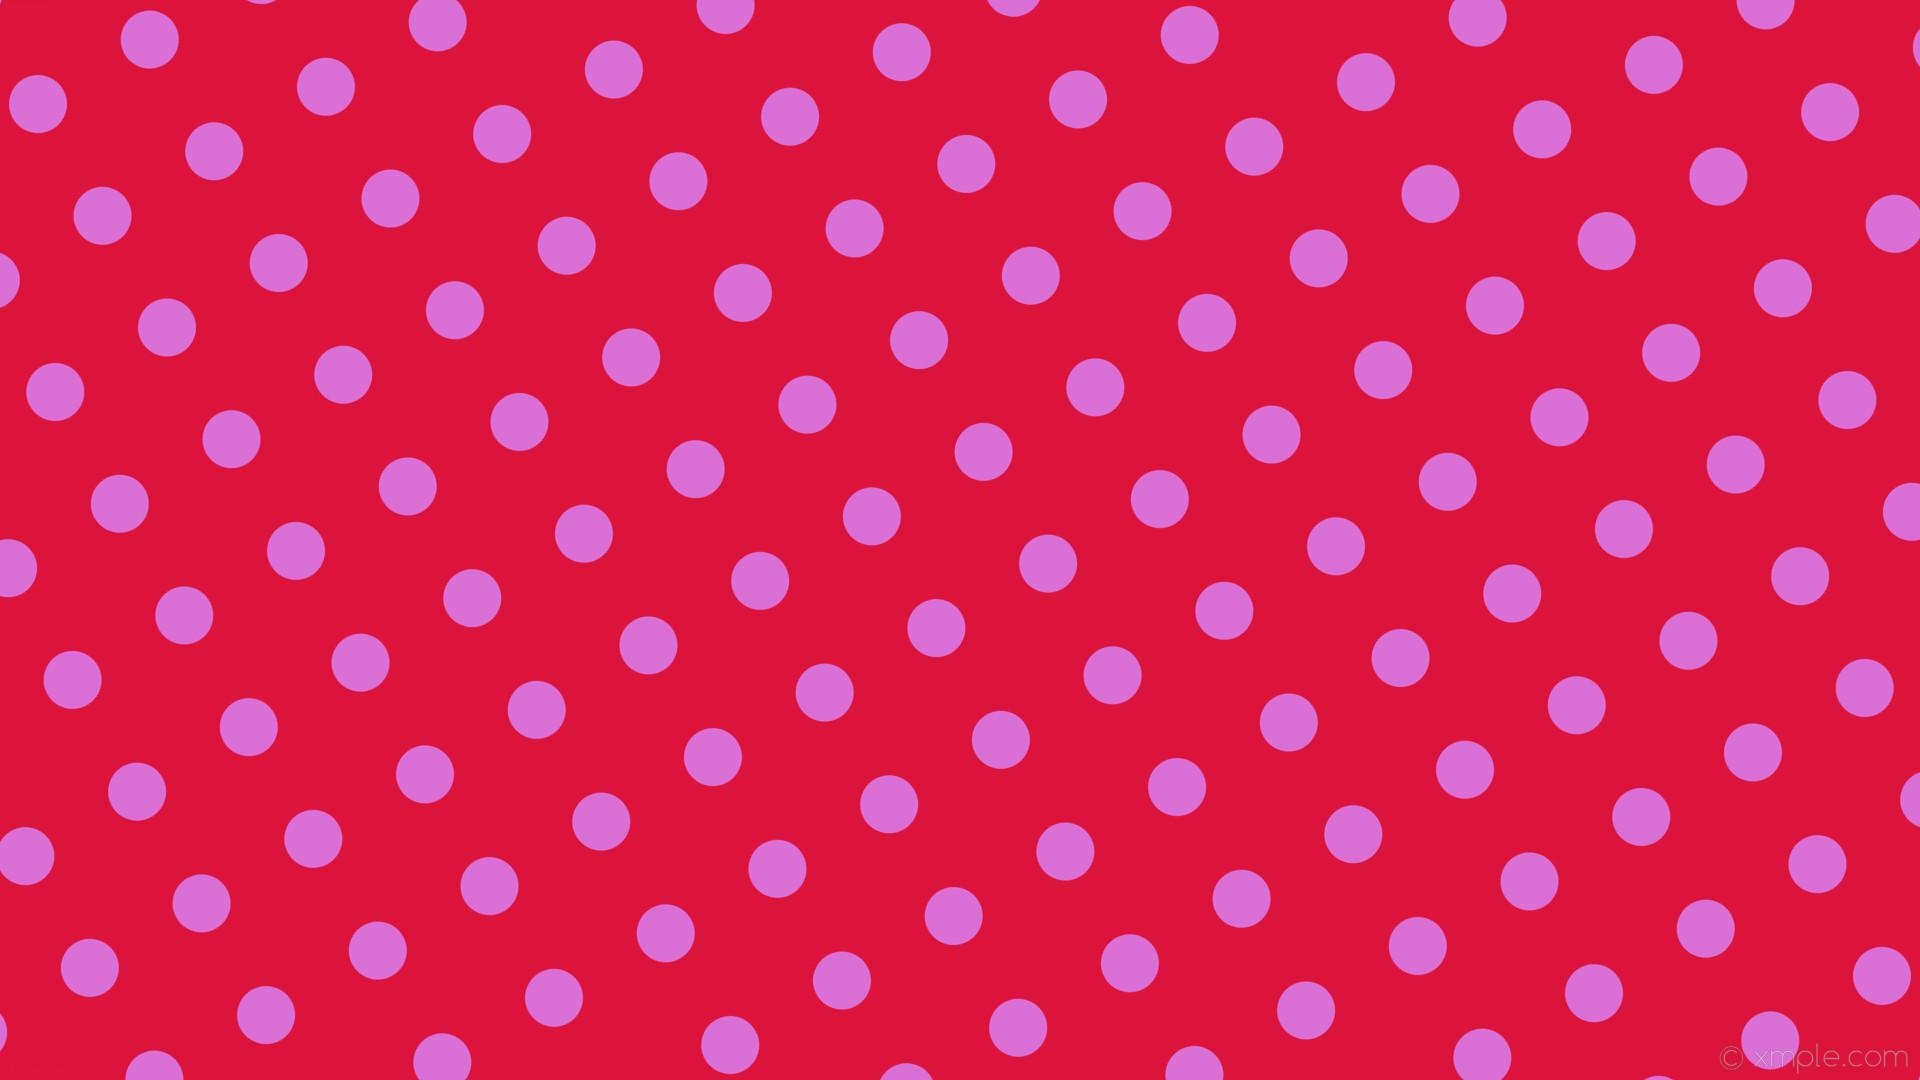 wallpaper red polka dots spots purple crimson orchid #dc143c #da70d6 30°  58px 129px